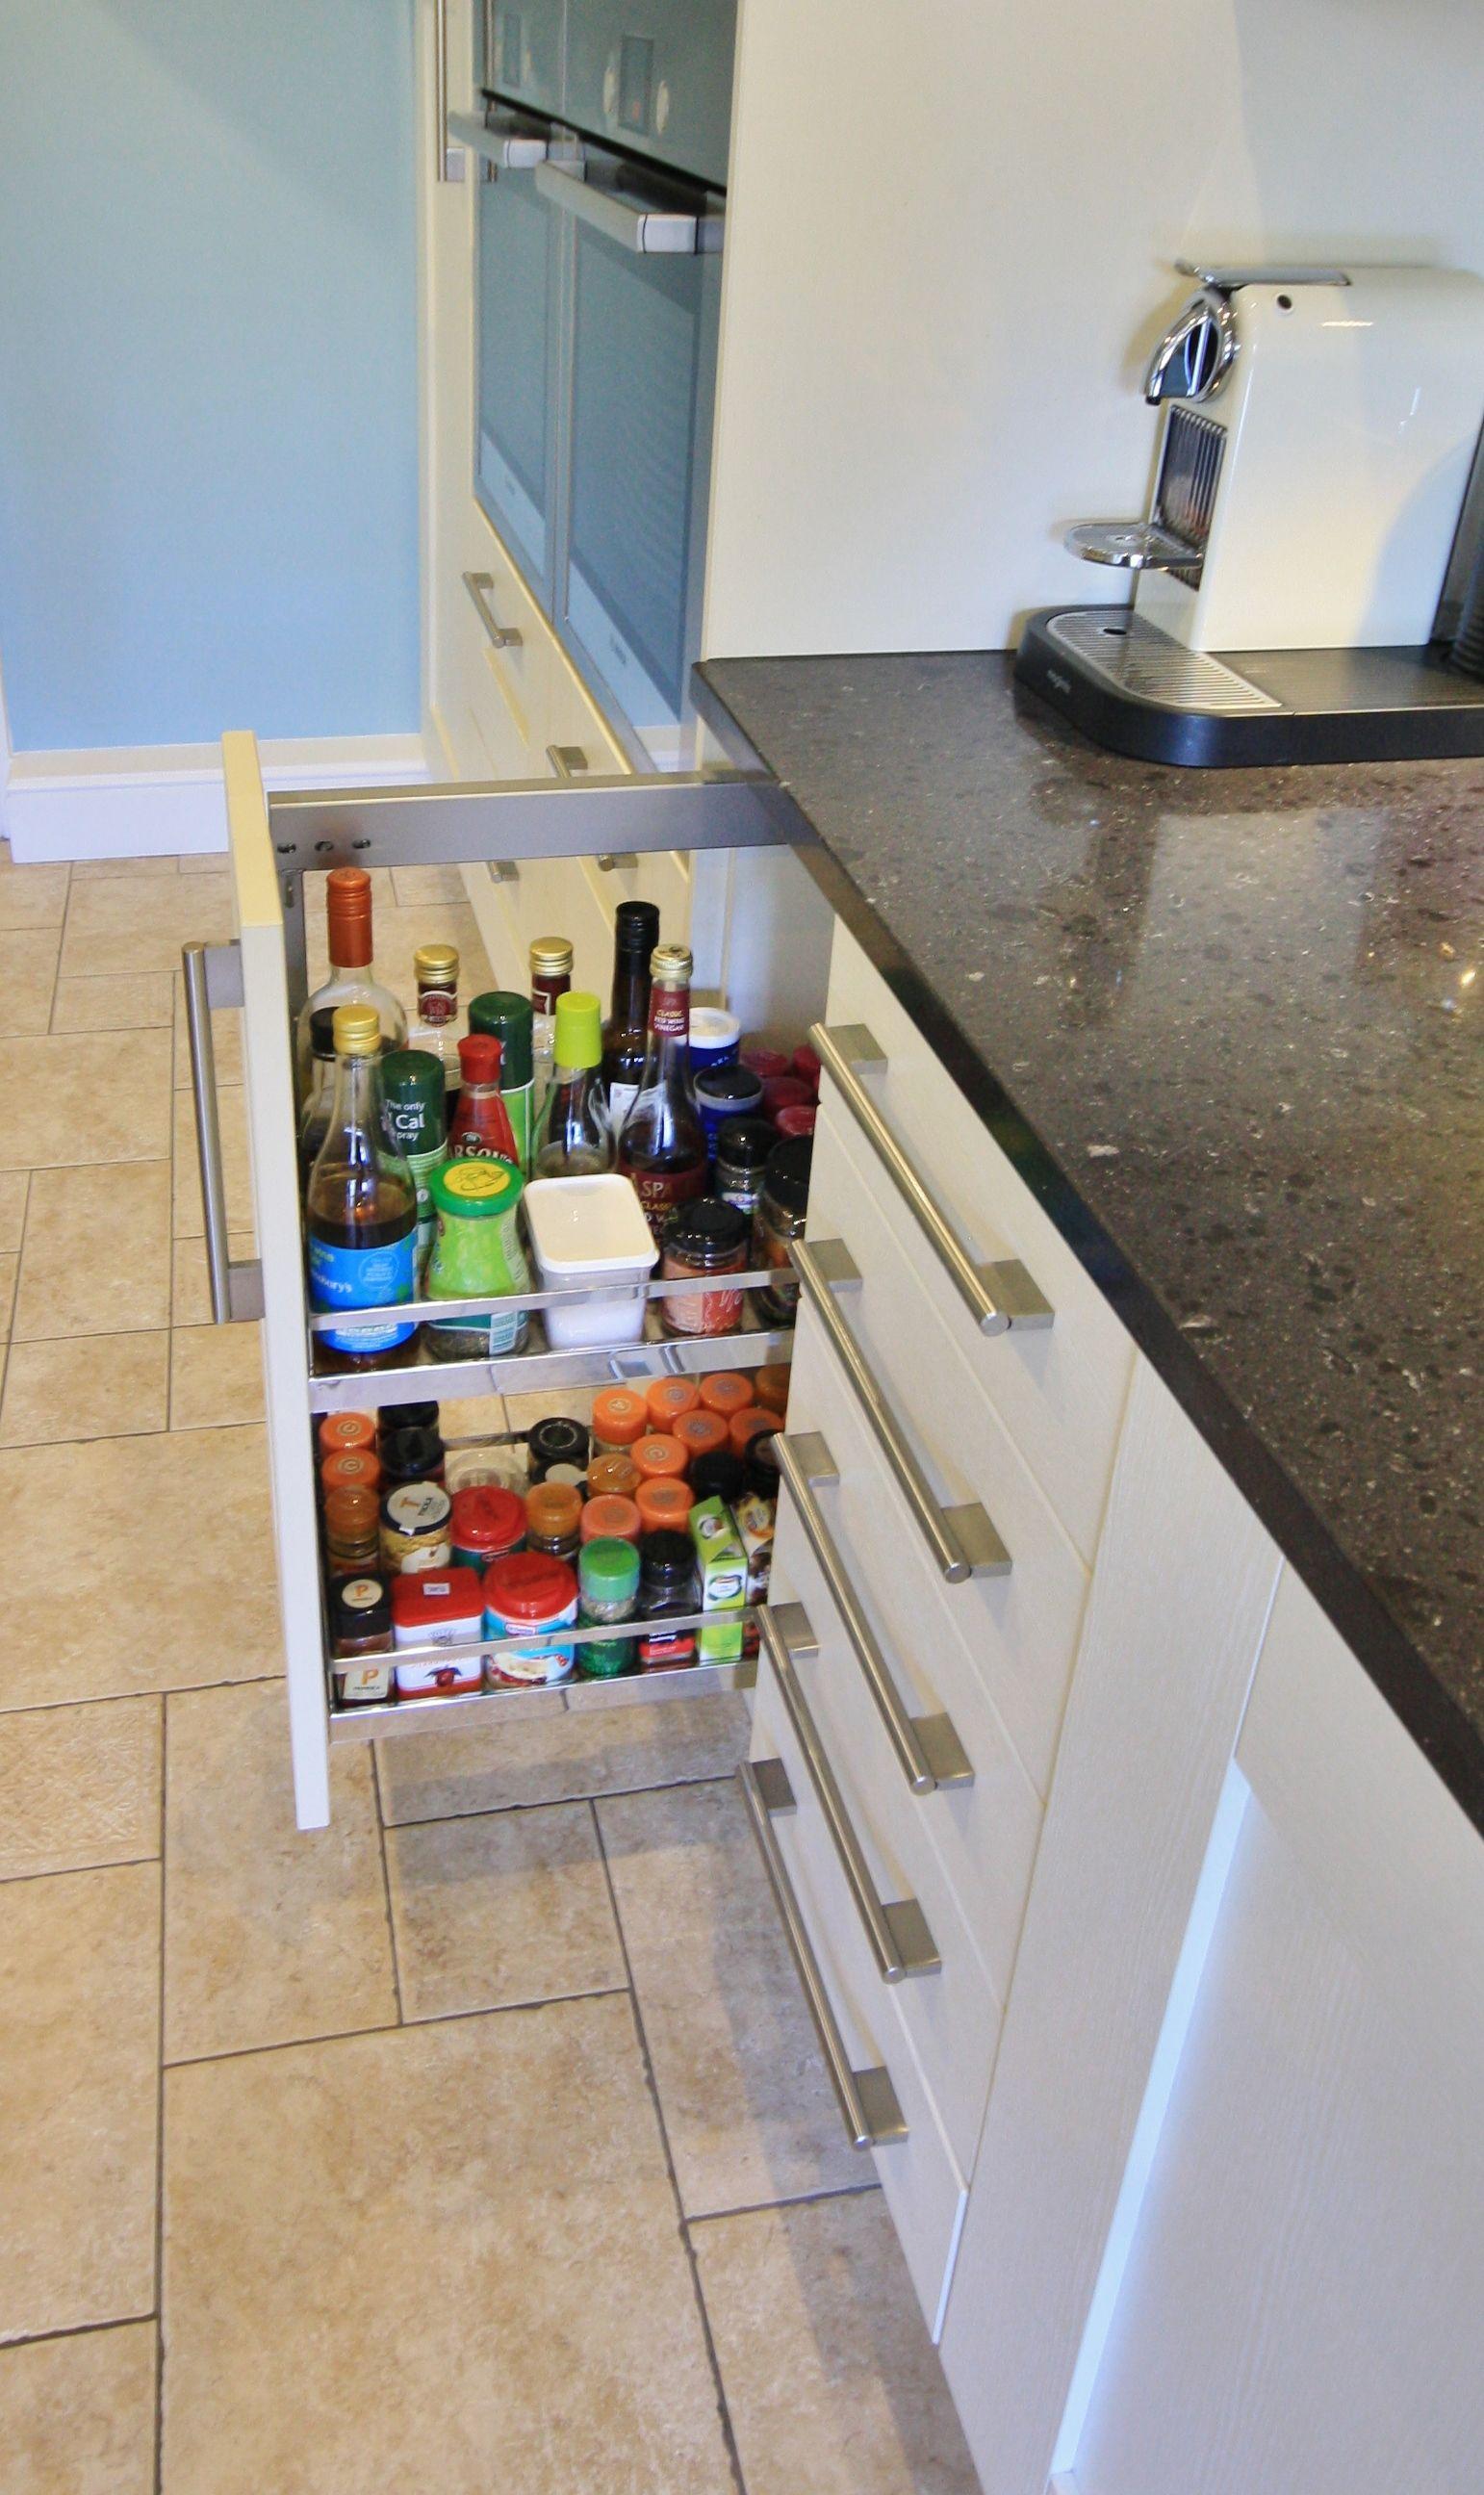 Base Unit Pull Out Larder For Spices And Sauces  Designed Captivating Designed Kitchen Appliances Design Decoration